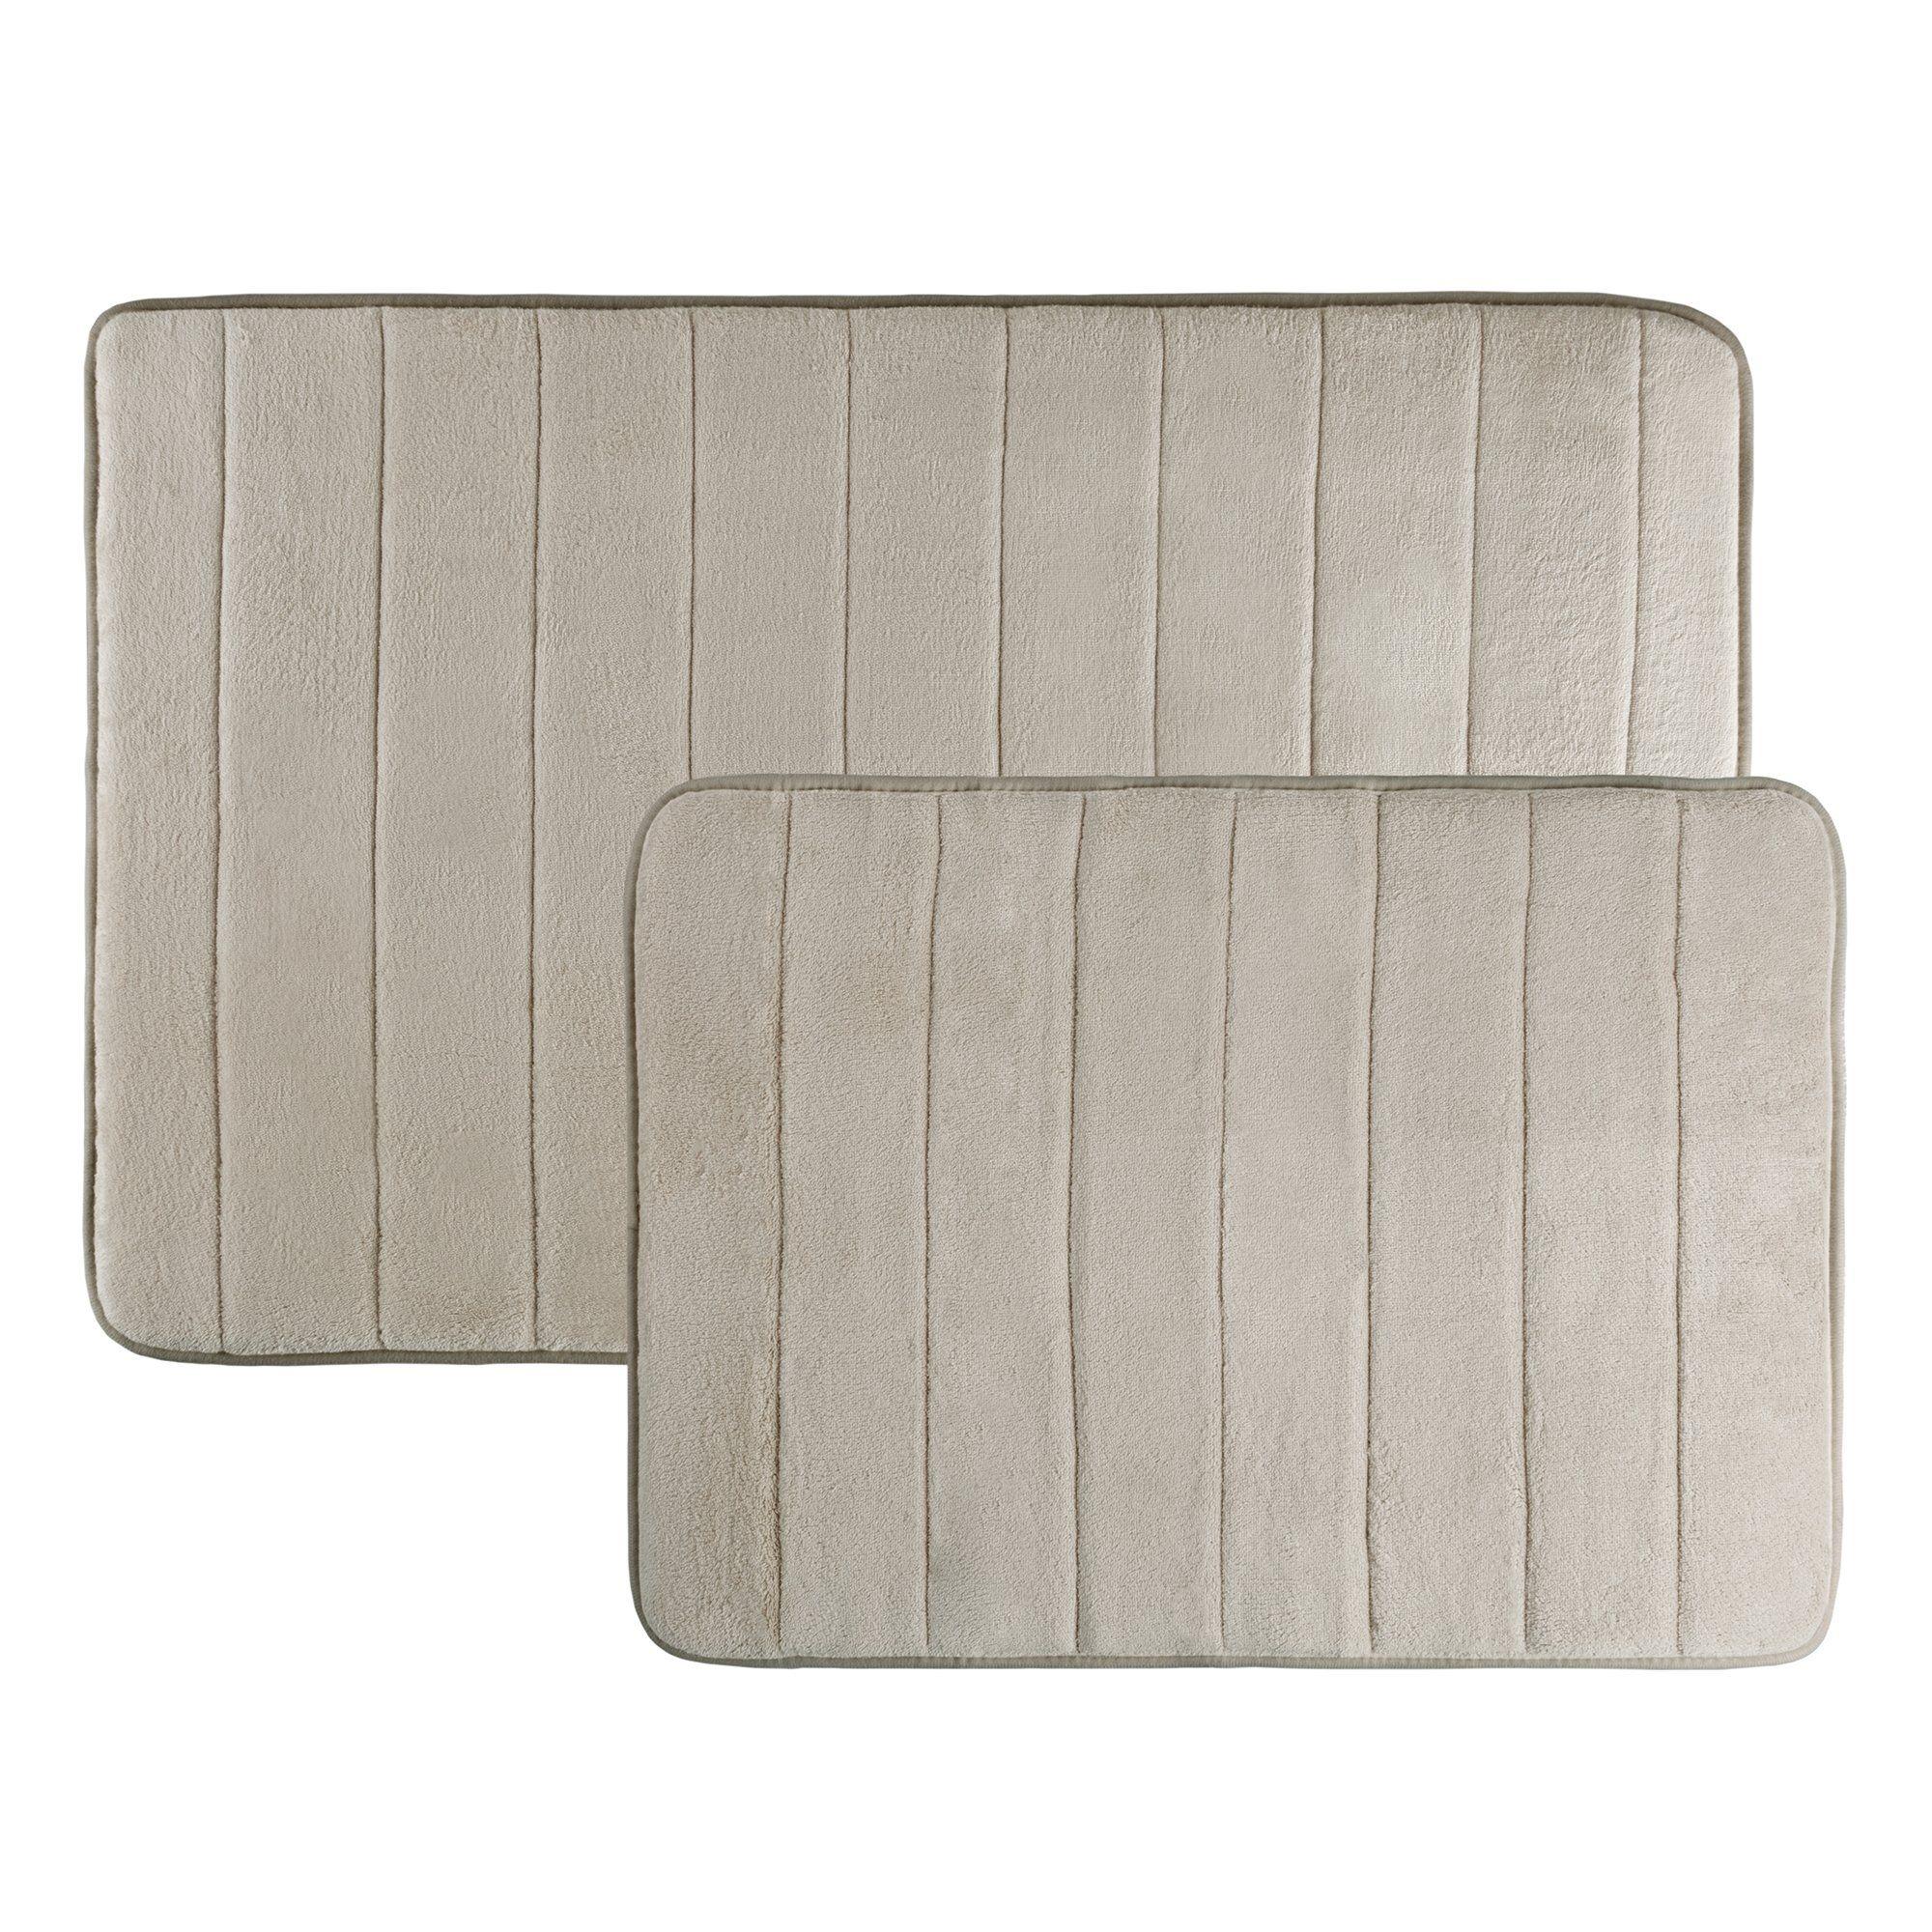 Memory Foam Bath Mats Non Slip And Fast Dry 2 Piece Bathroom Mat